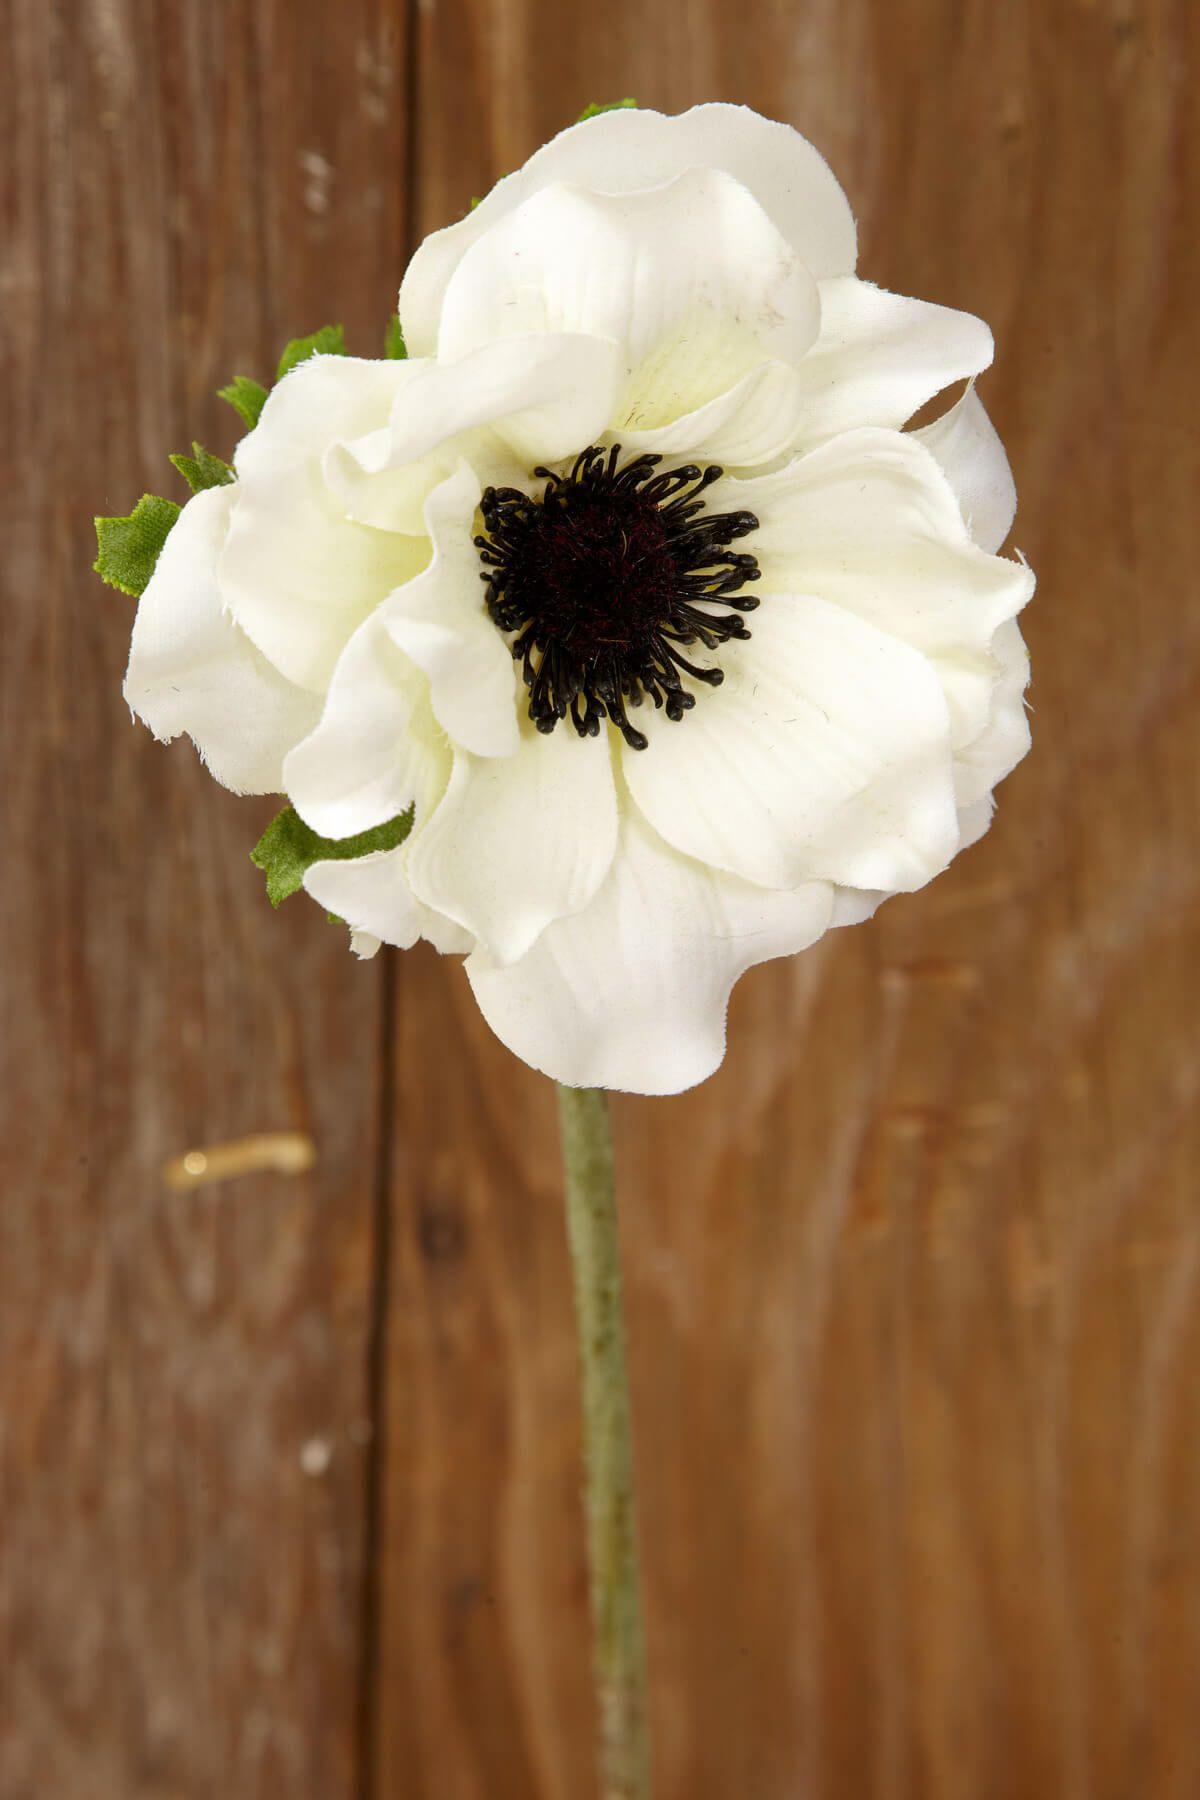 Anemone spray in cream pinterest white anemone anemone flower cream white silk anemone flowers 15in mightylinksfo